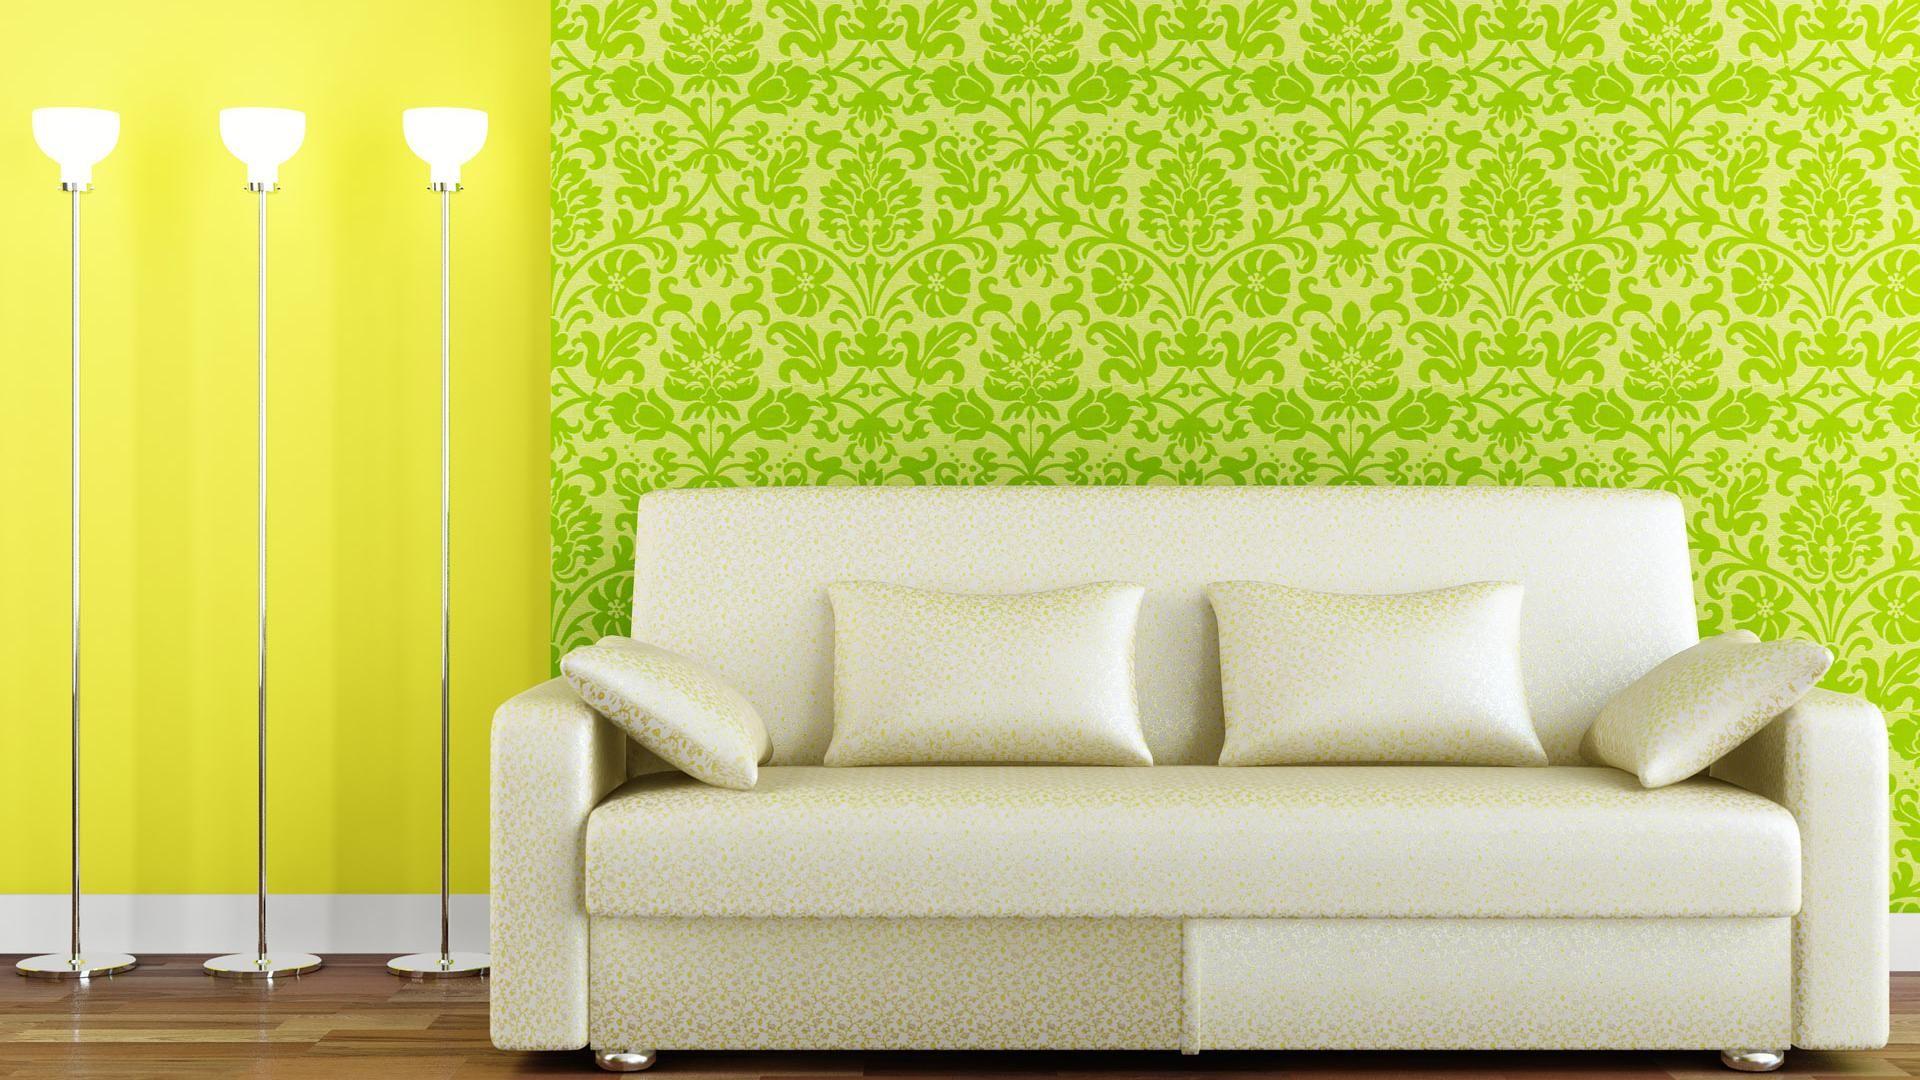 Furniture download nice wallpaper